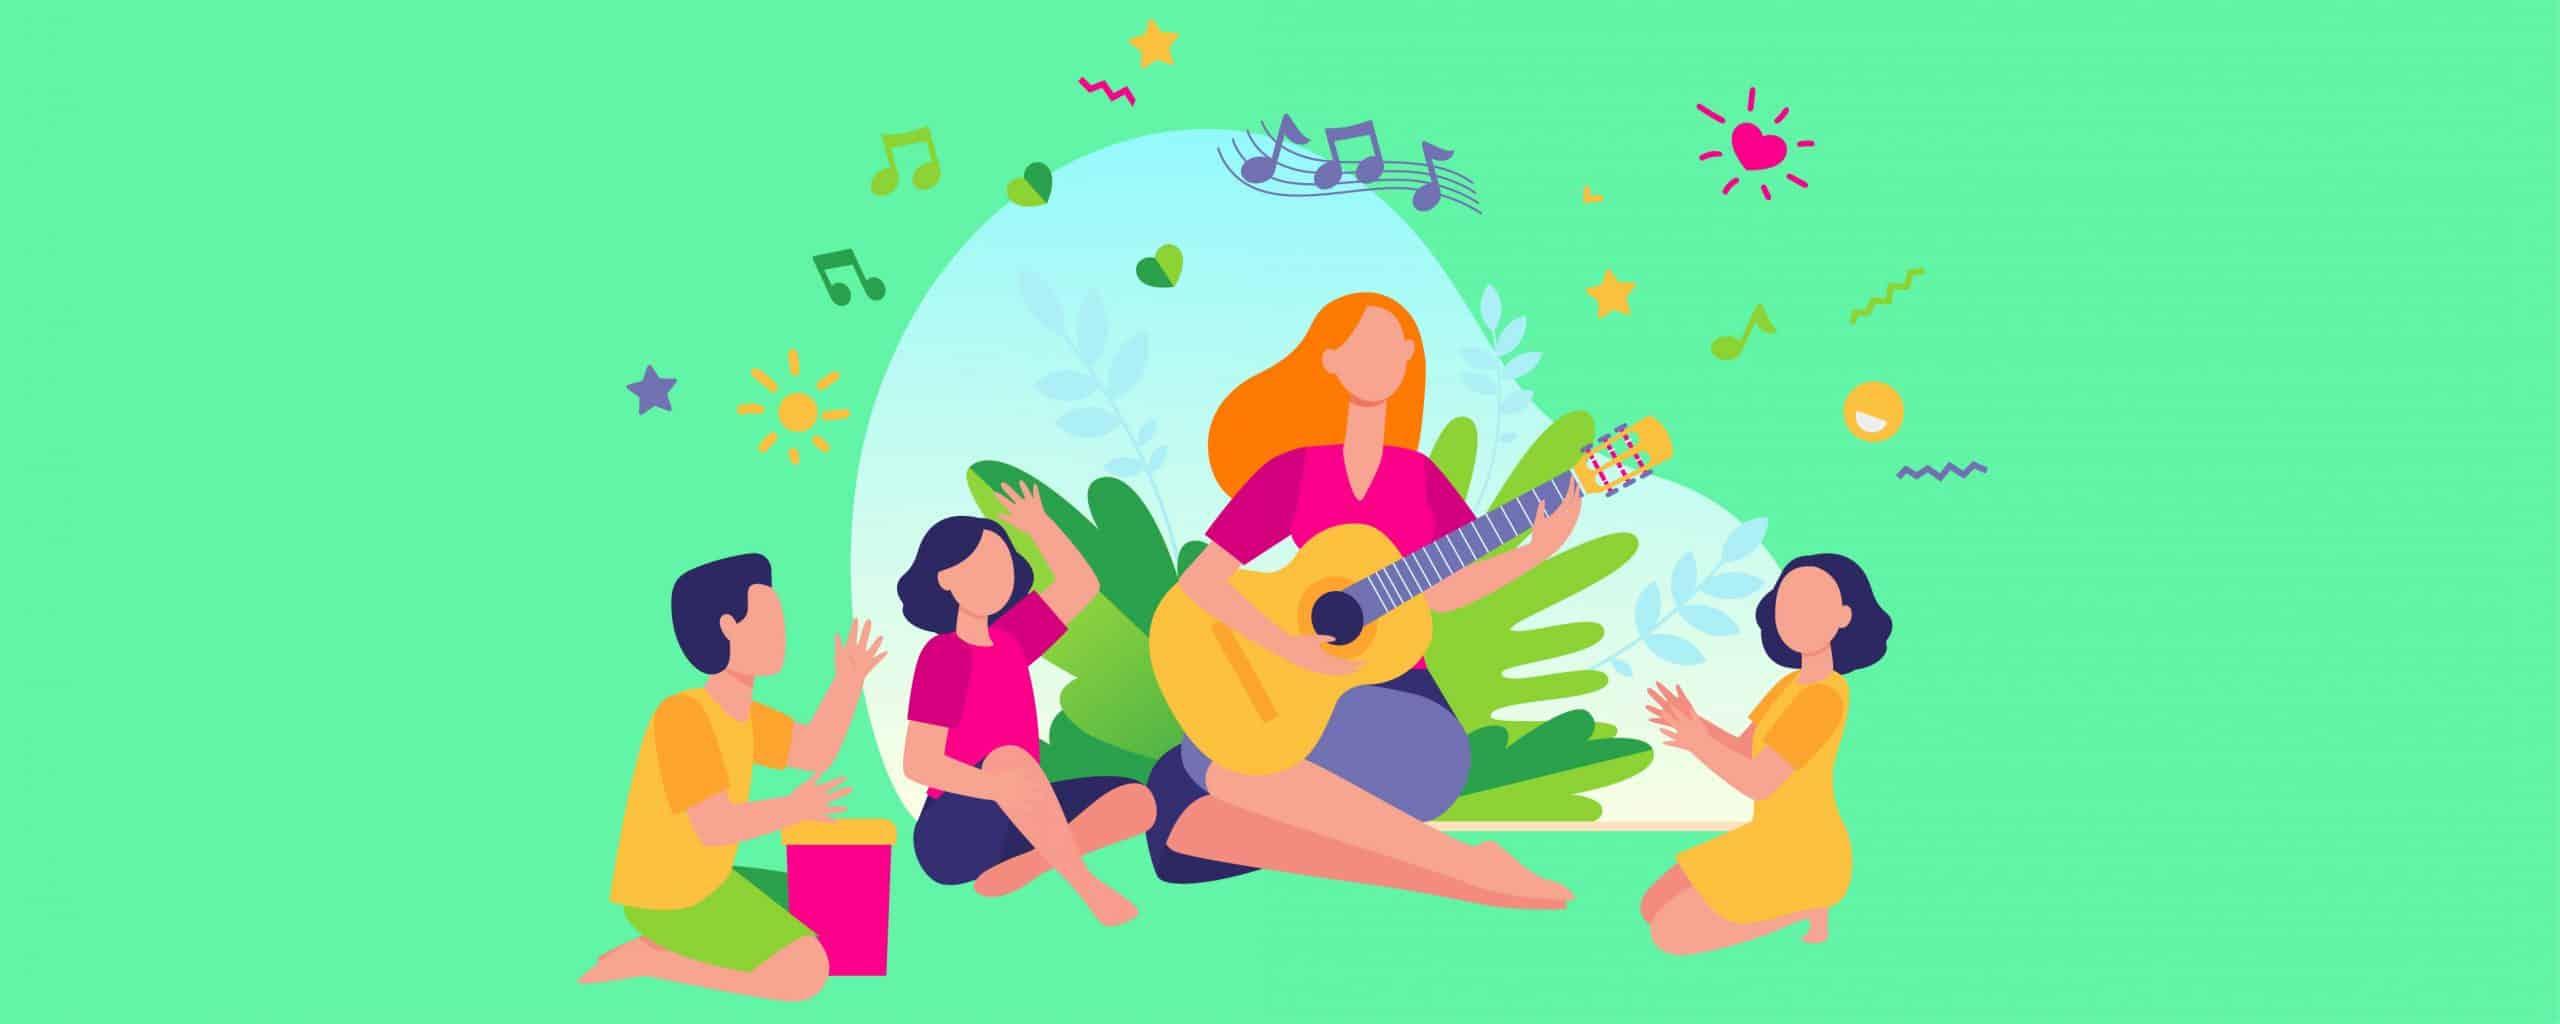 Ways Music Can Improve Health